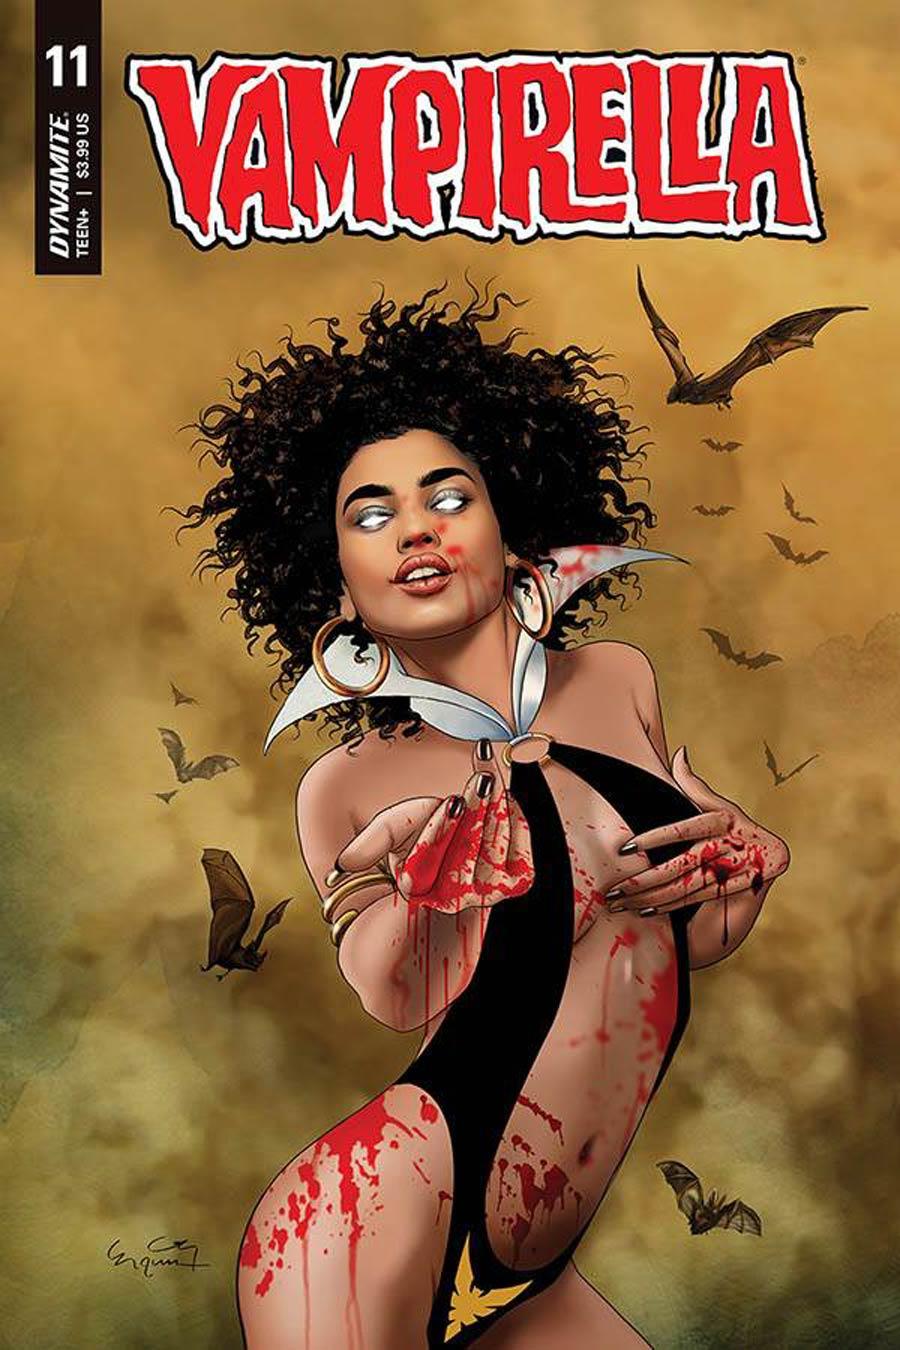 Vampirella Vol 8 #11 Cover D Variant Ergun Gunduz Cover